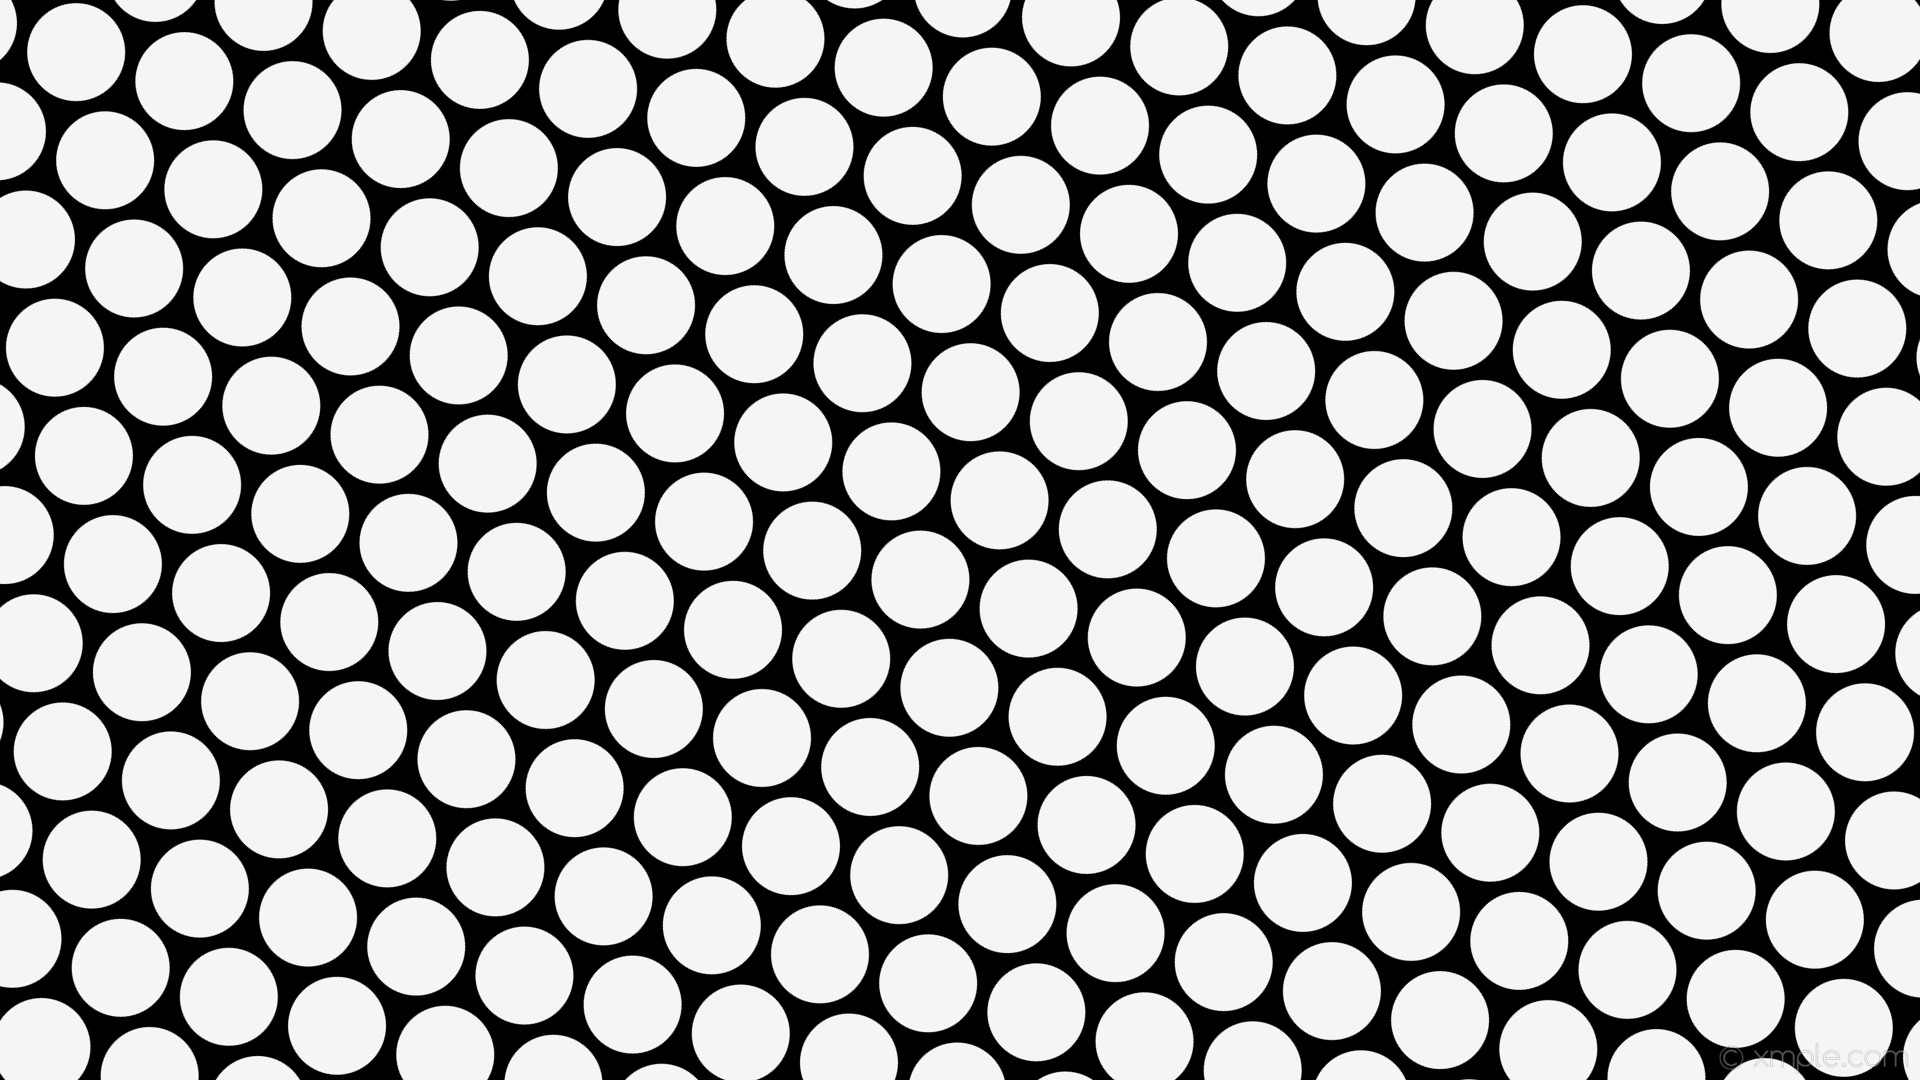 wallpaper hexagon black white polka dots white smoke #000000 #f5f5f5  diagonal 45° 98px